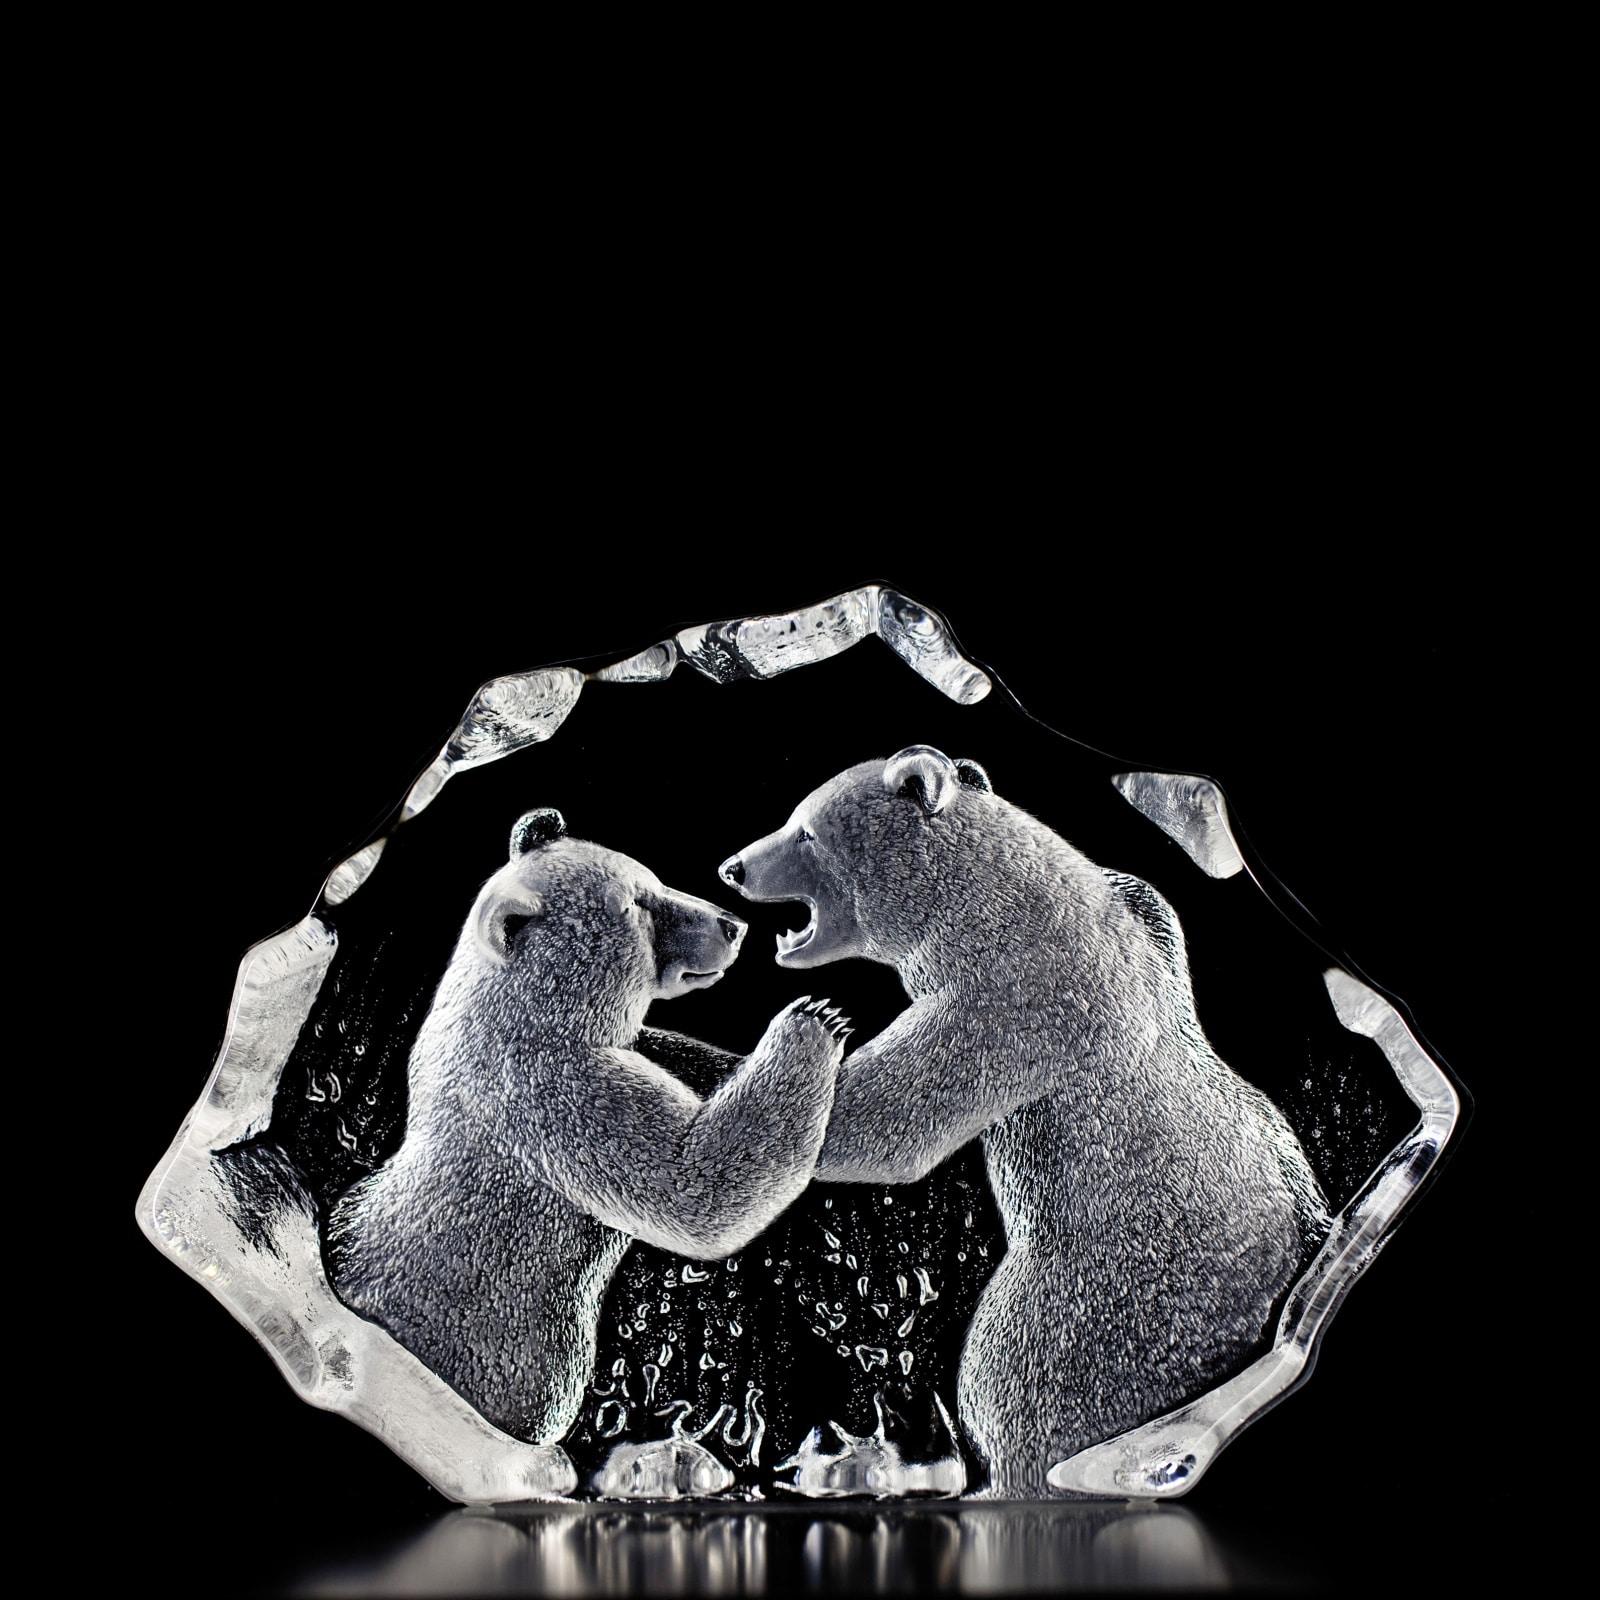 Mats Jonasson - Grizzly Bears